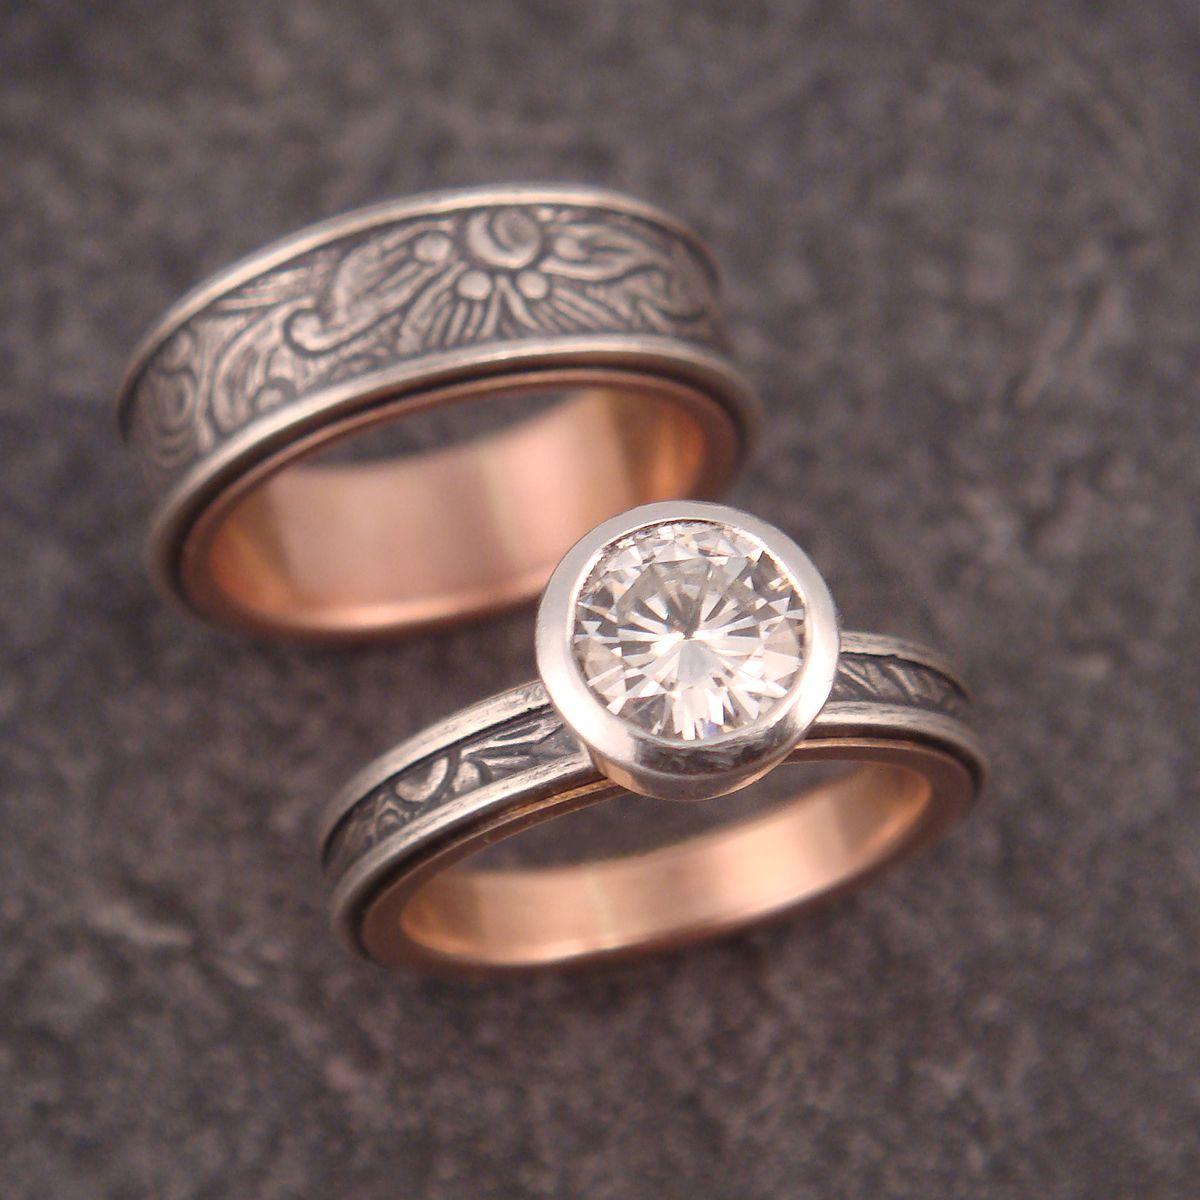 Wedding Band Engagement Ring